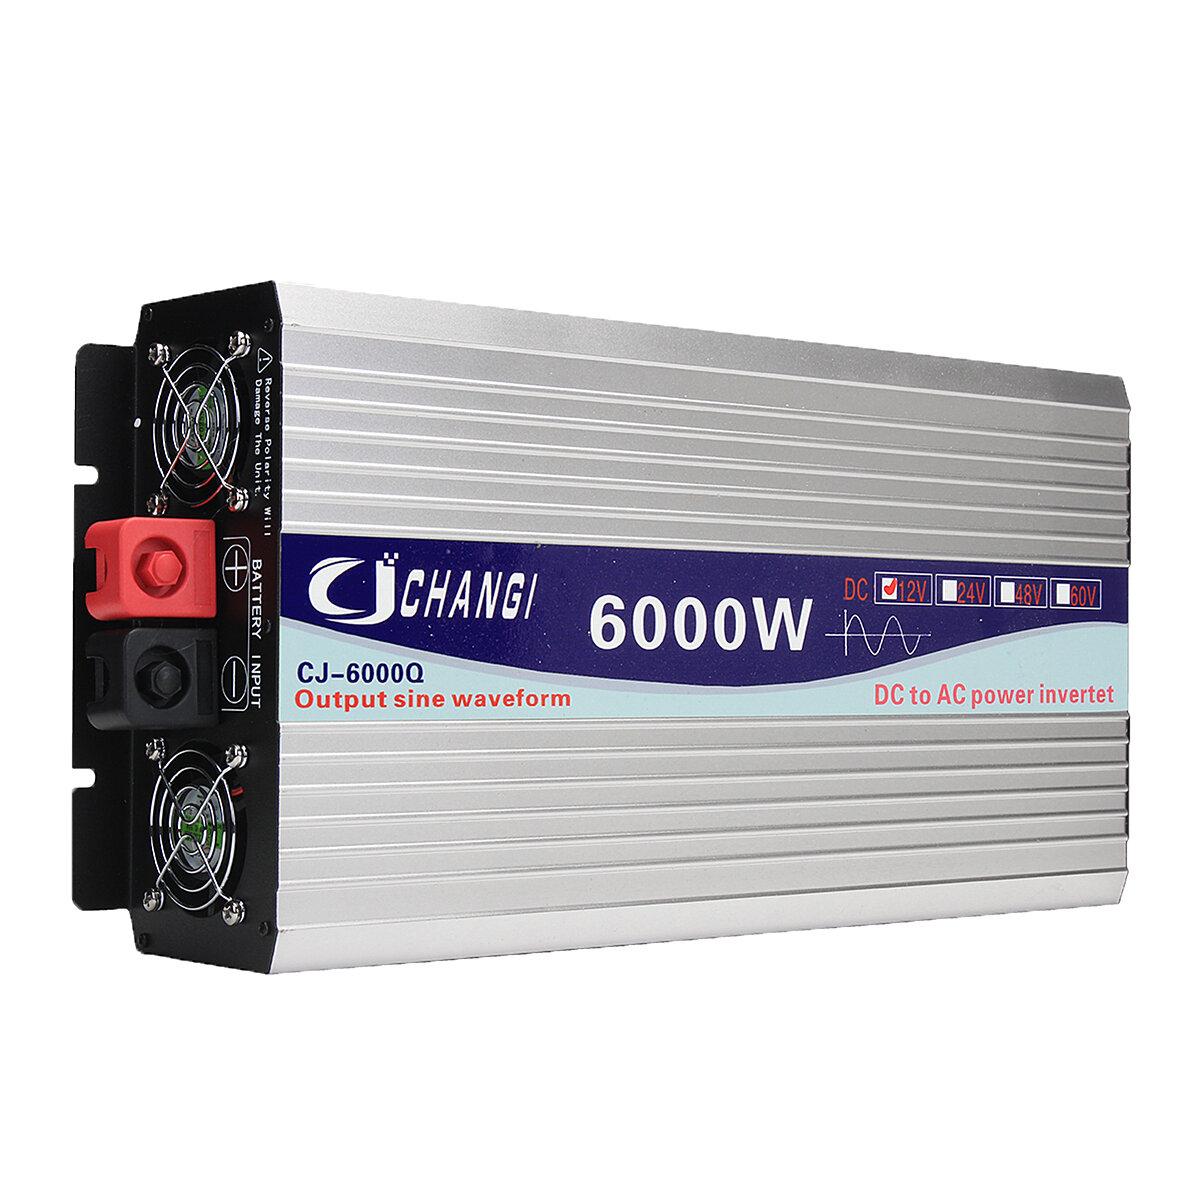 Layar Cerdas Murni Sine Wave Power Inverter 12V / 24V Untuk 220V 3000W / 4000W / 5000W / 6000W Converter